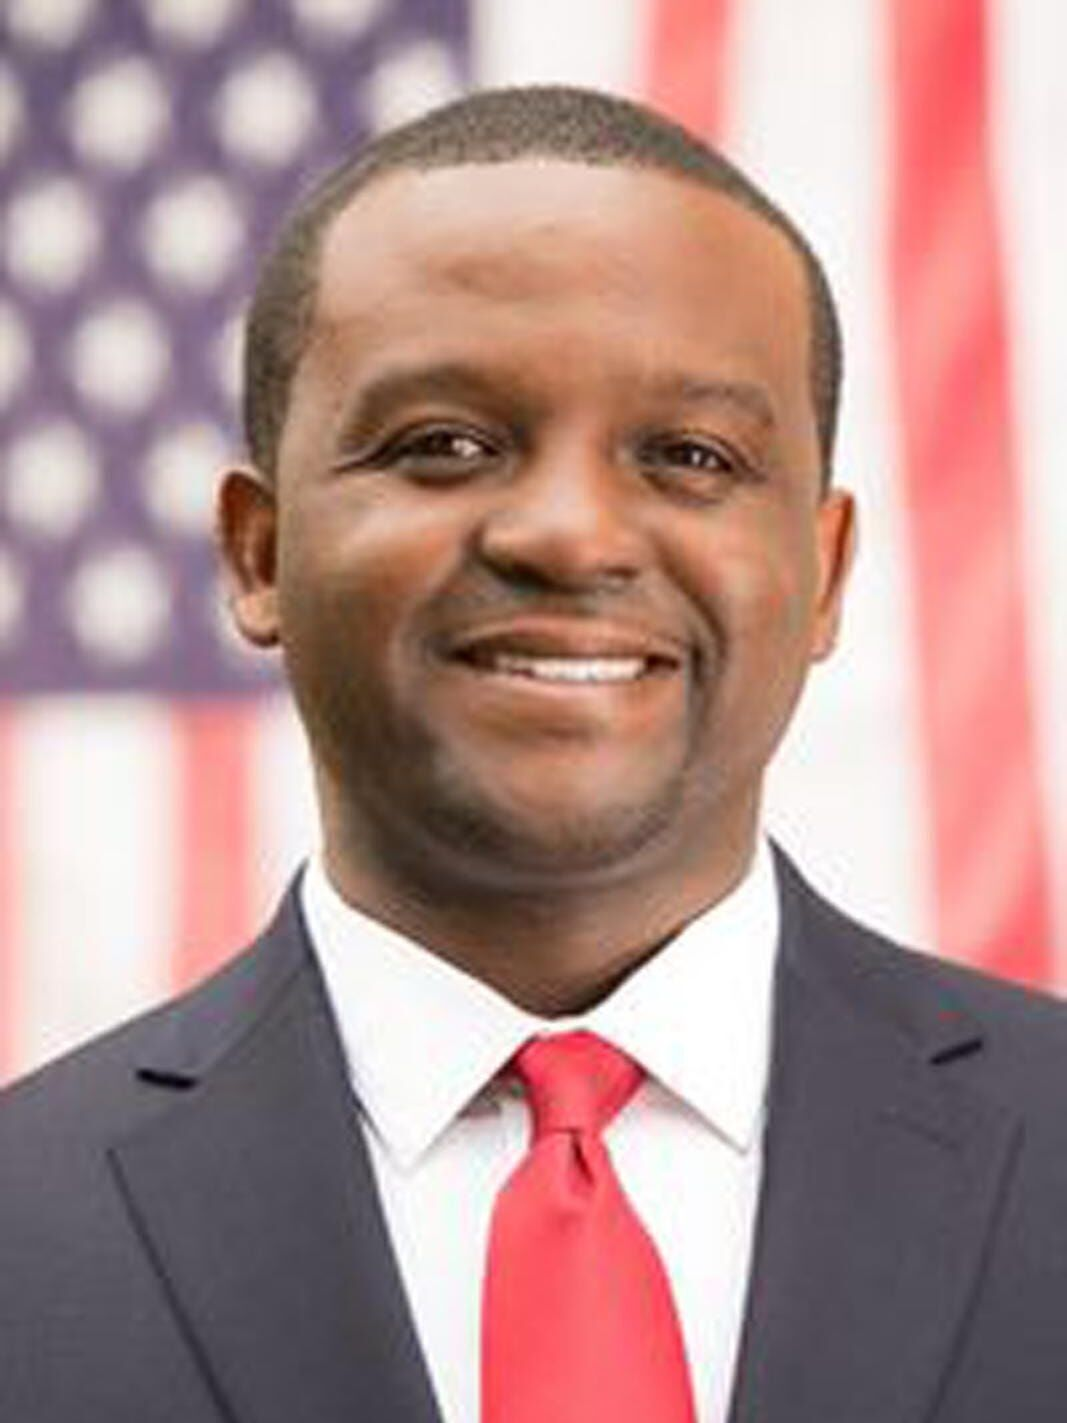 Daniel Blackman (PSC candidate)